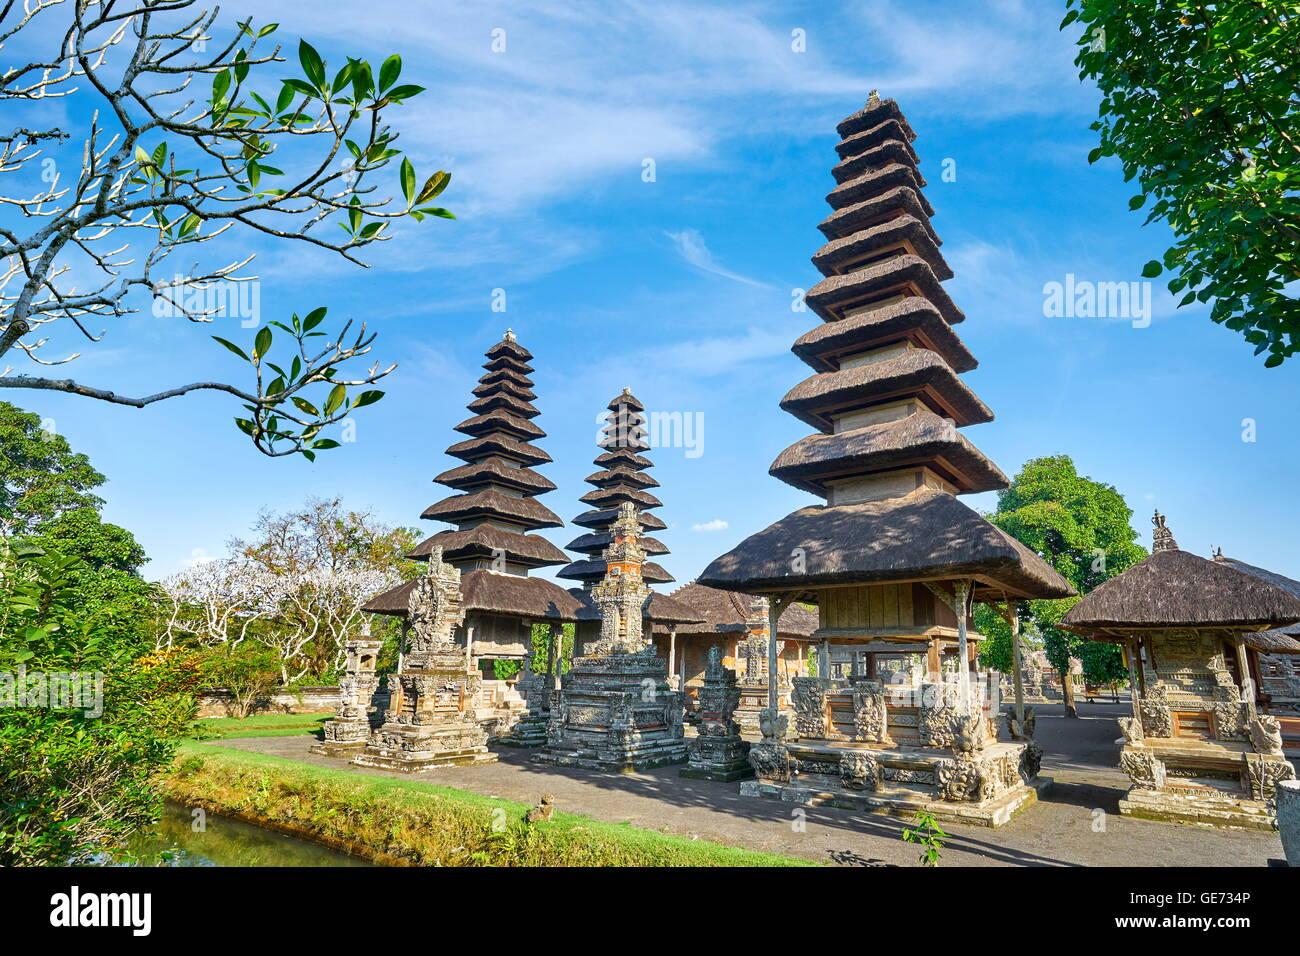 Royal Temple of Mengwi, Pura Taman Ayun Temple, Bali, Indonesia - Stock Image